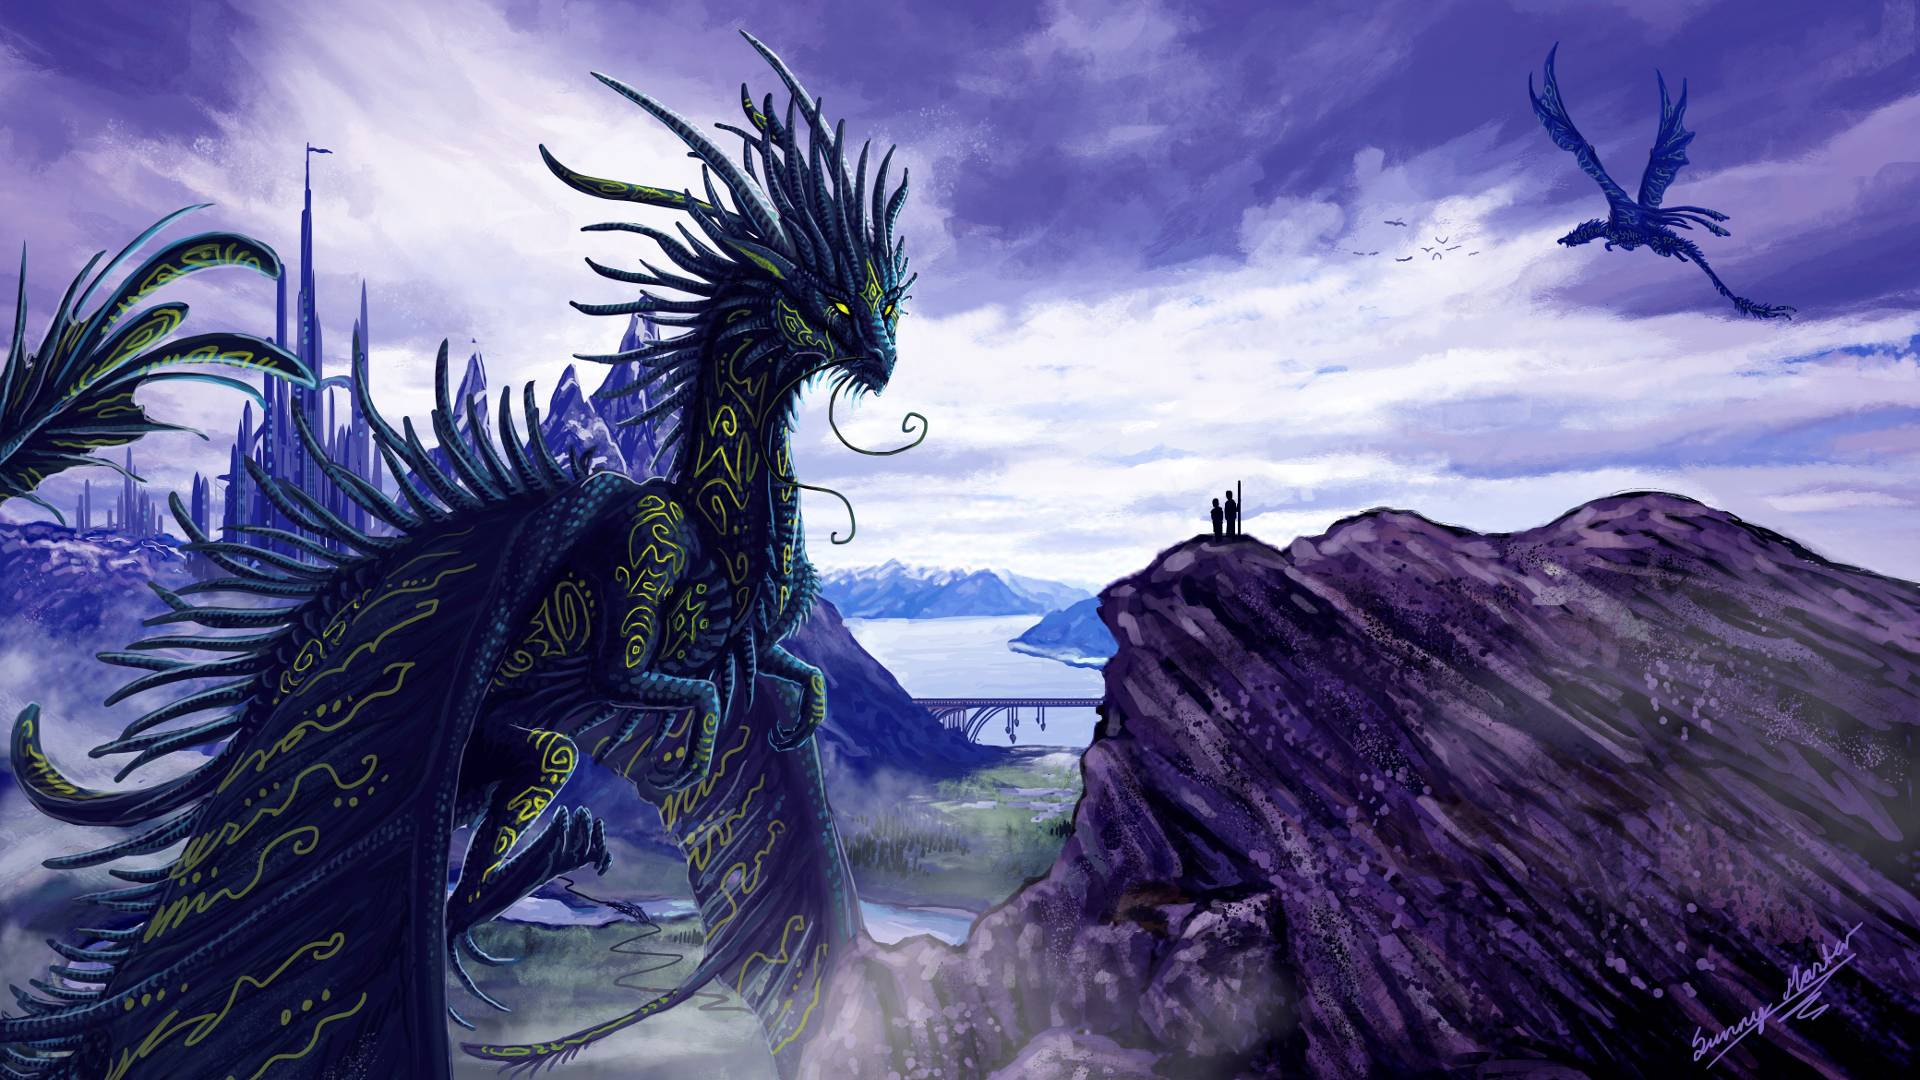 purple dragon wallpapers - wallpaper cave